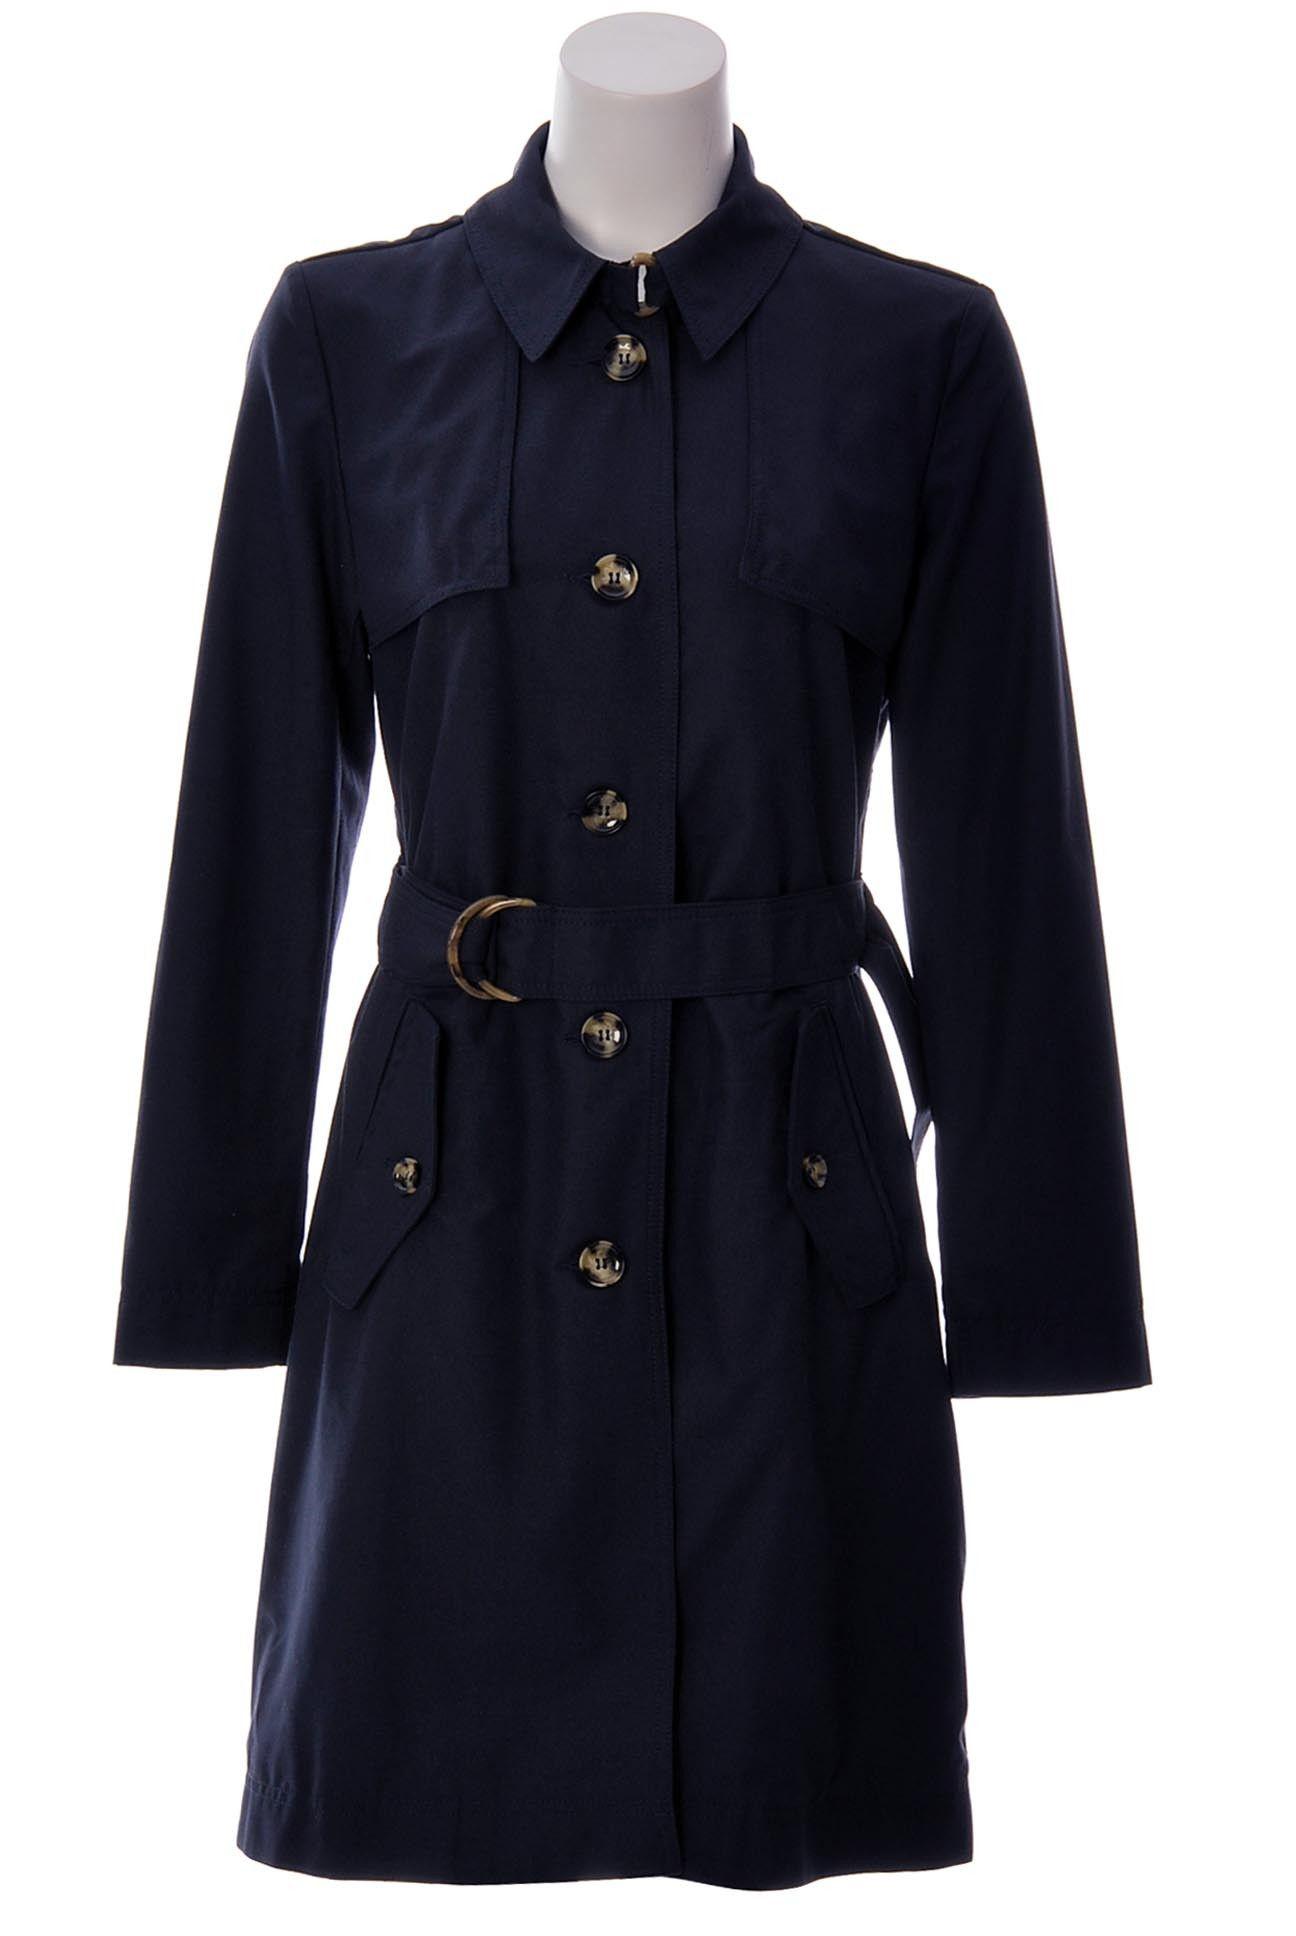 Armani jeans womens trench coat menus designer clothing u brands